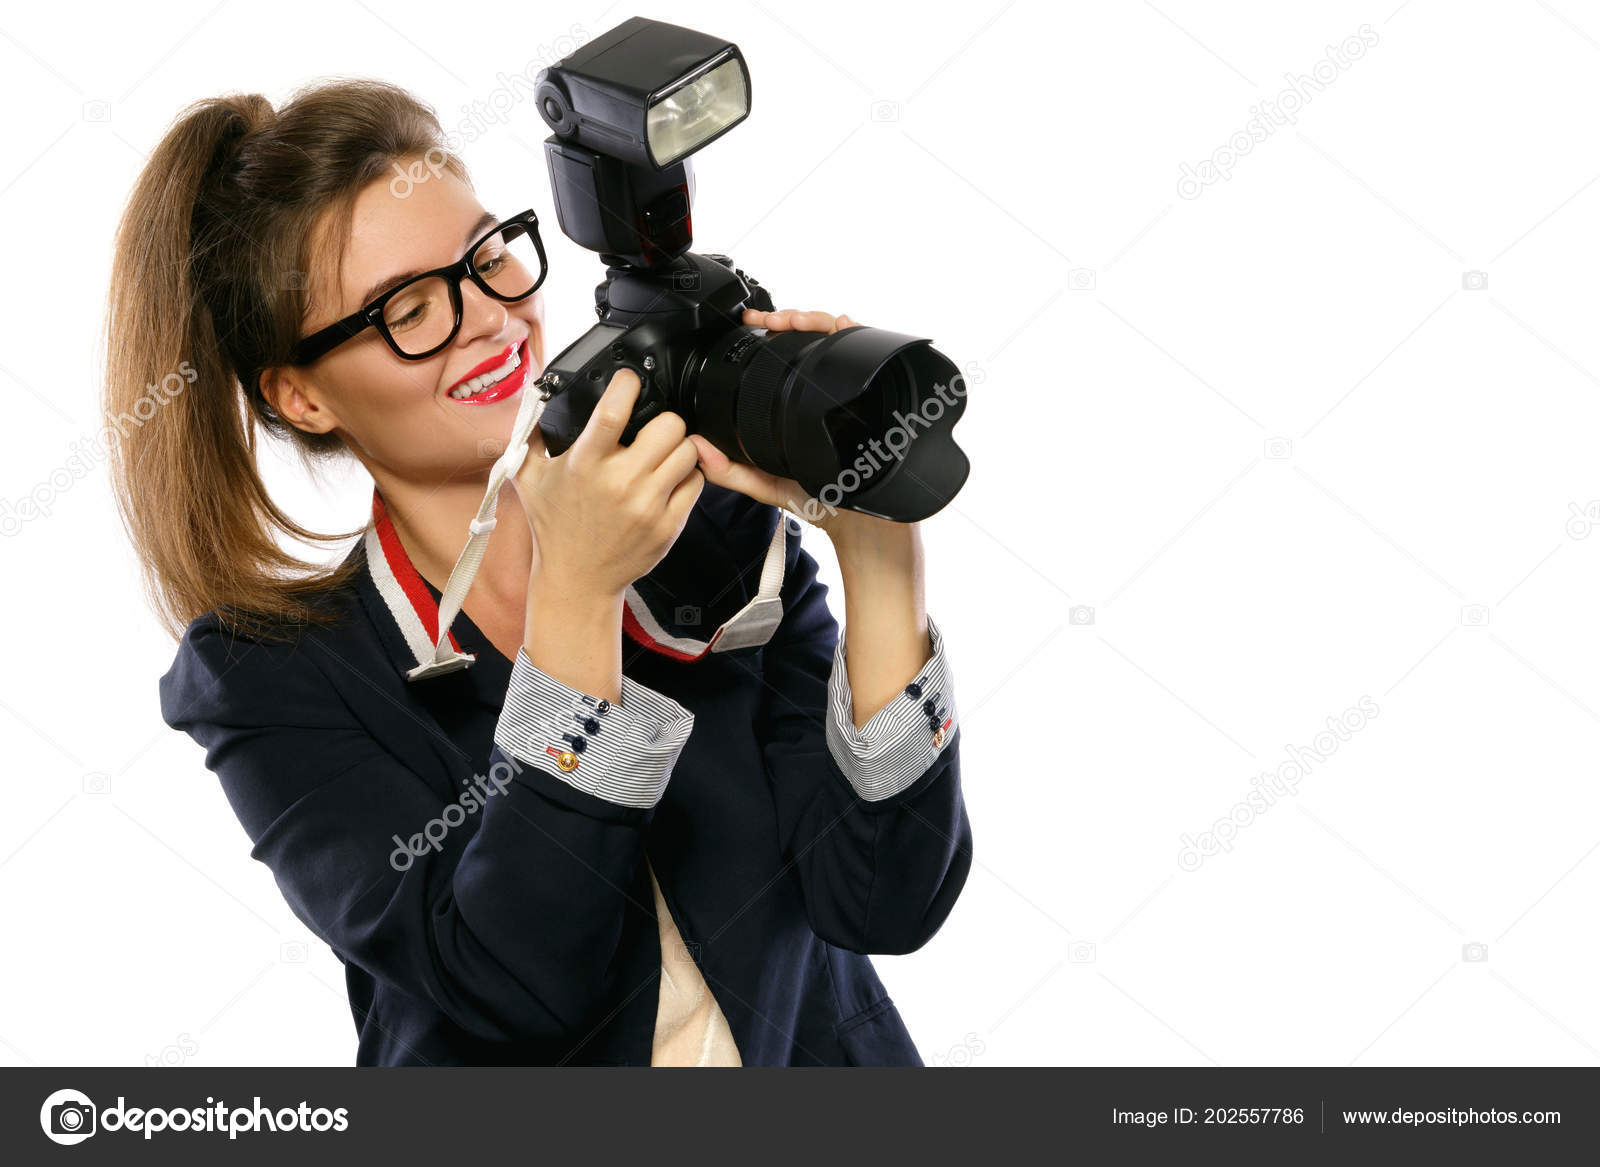 Woman Photographer Dslr Camera Isolated White Background